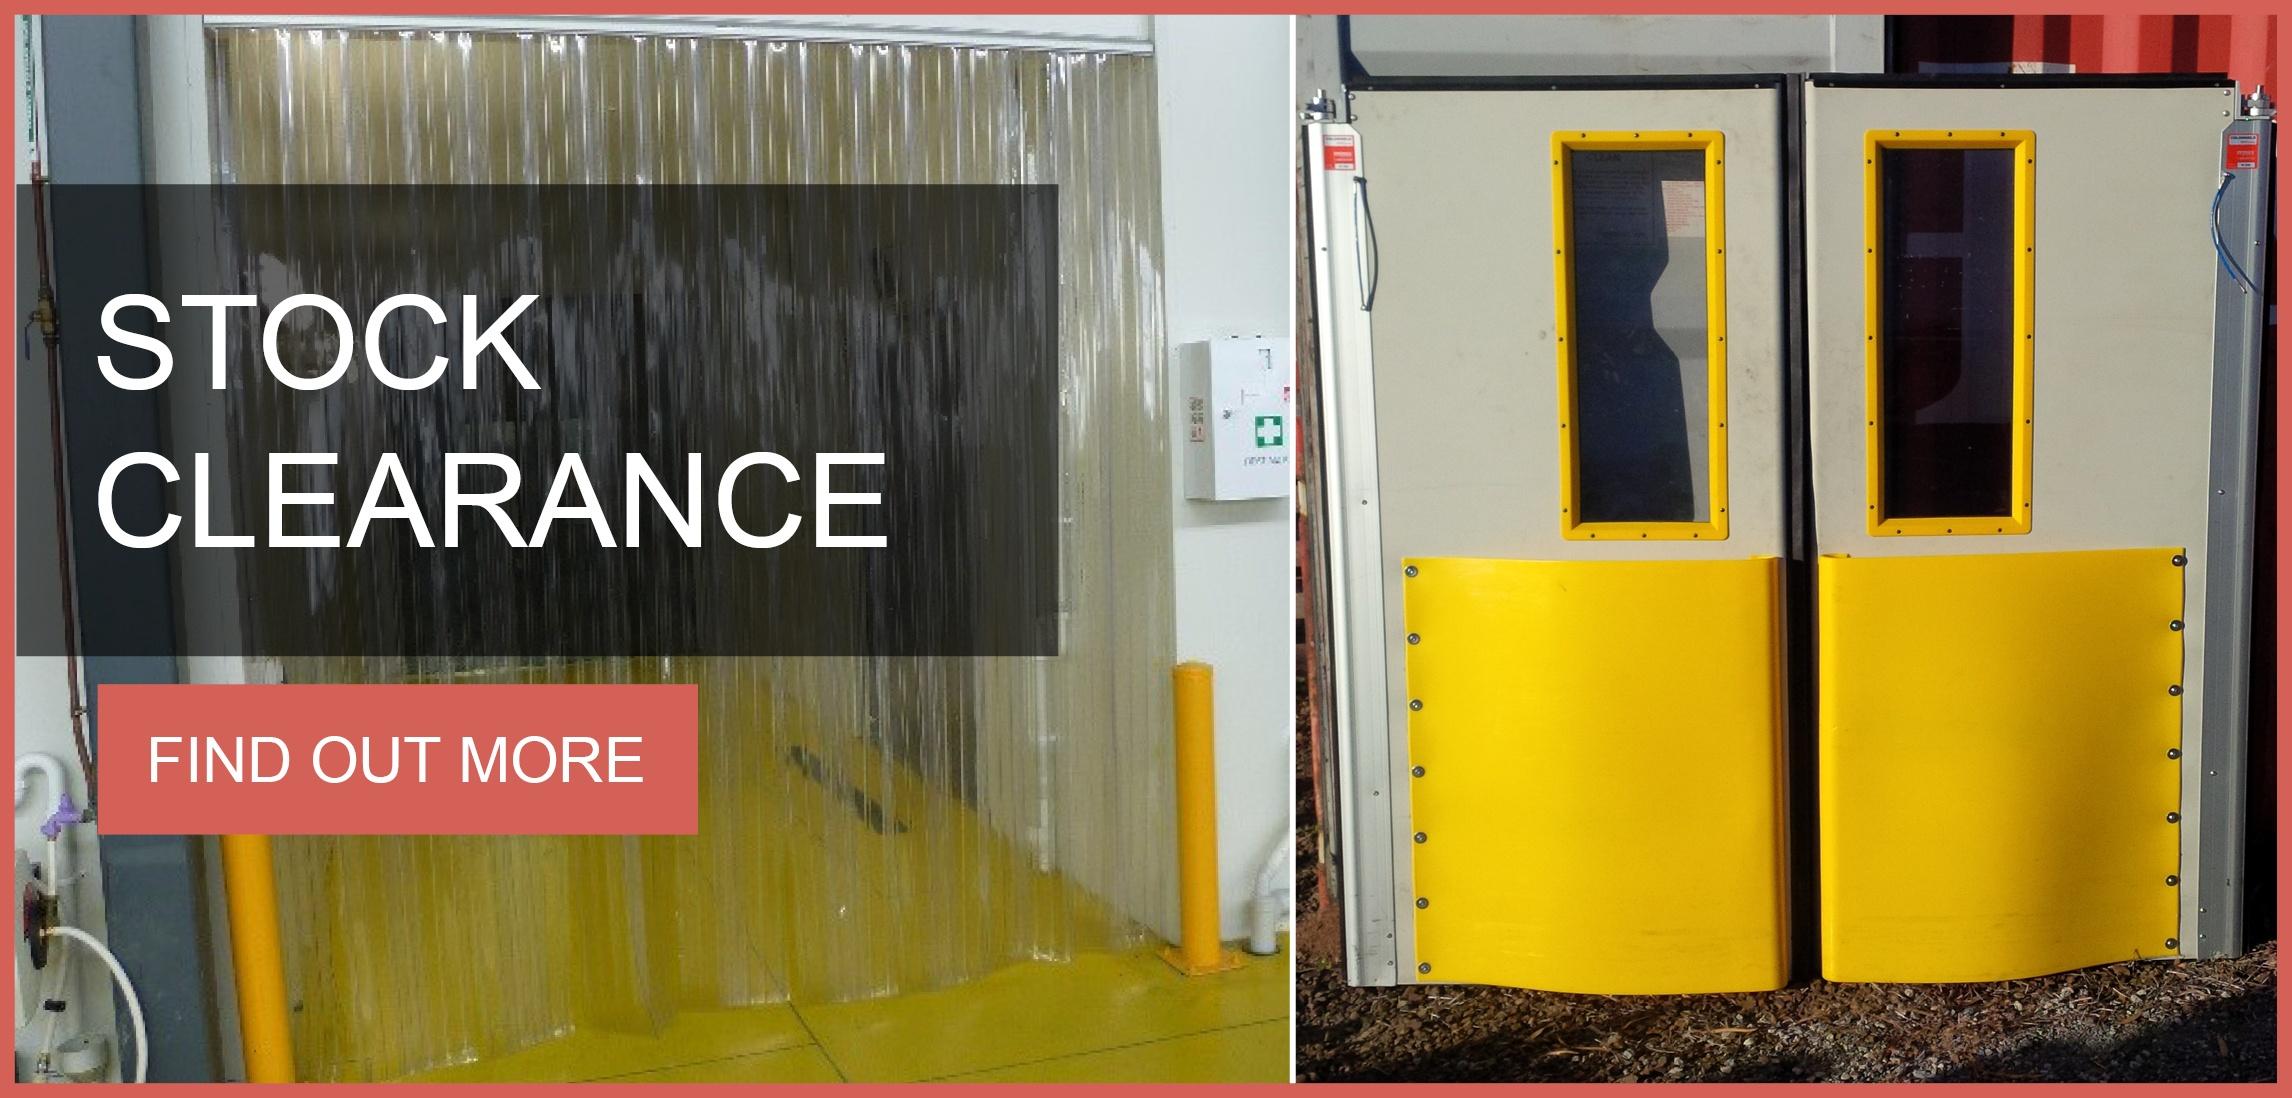 Stock clearance image.jpg